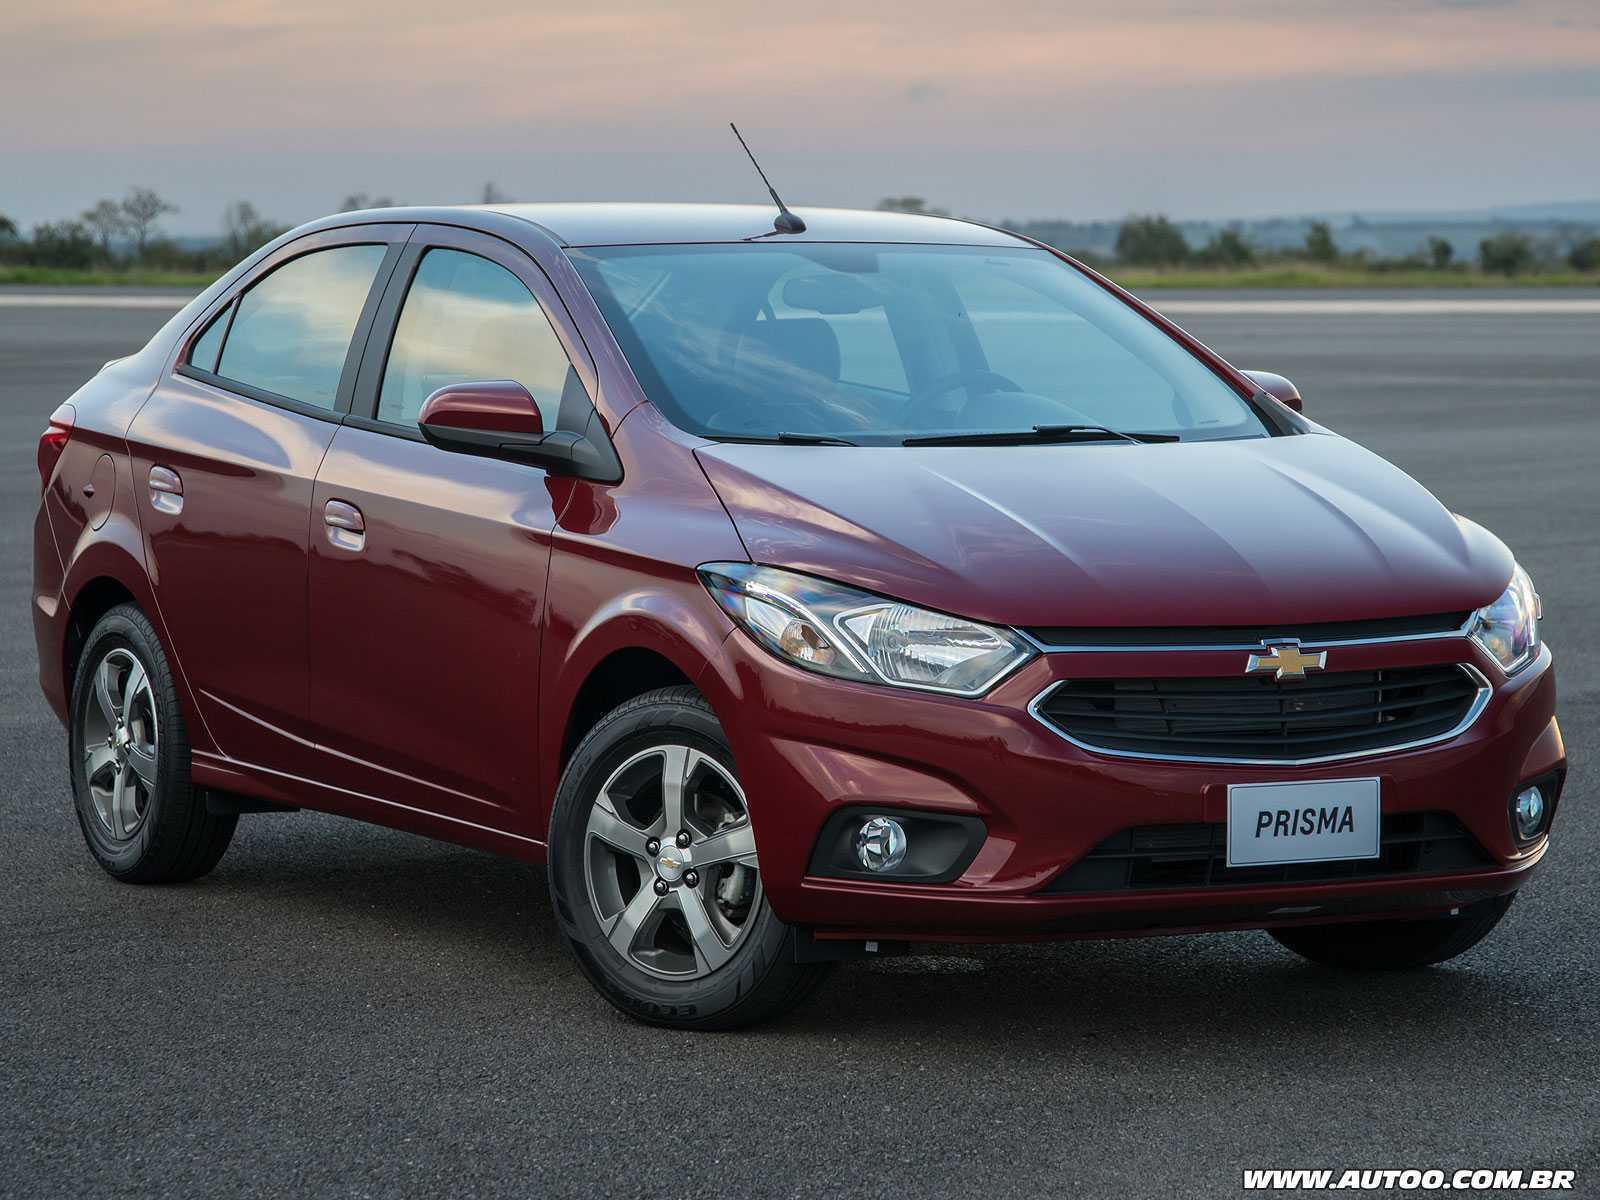 ChevroletPrisma 2017 - ângulo frontal